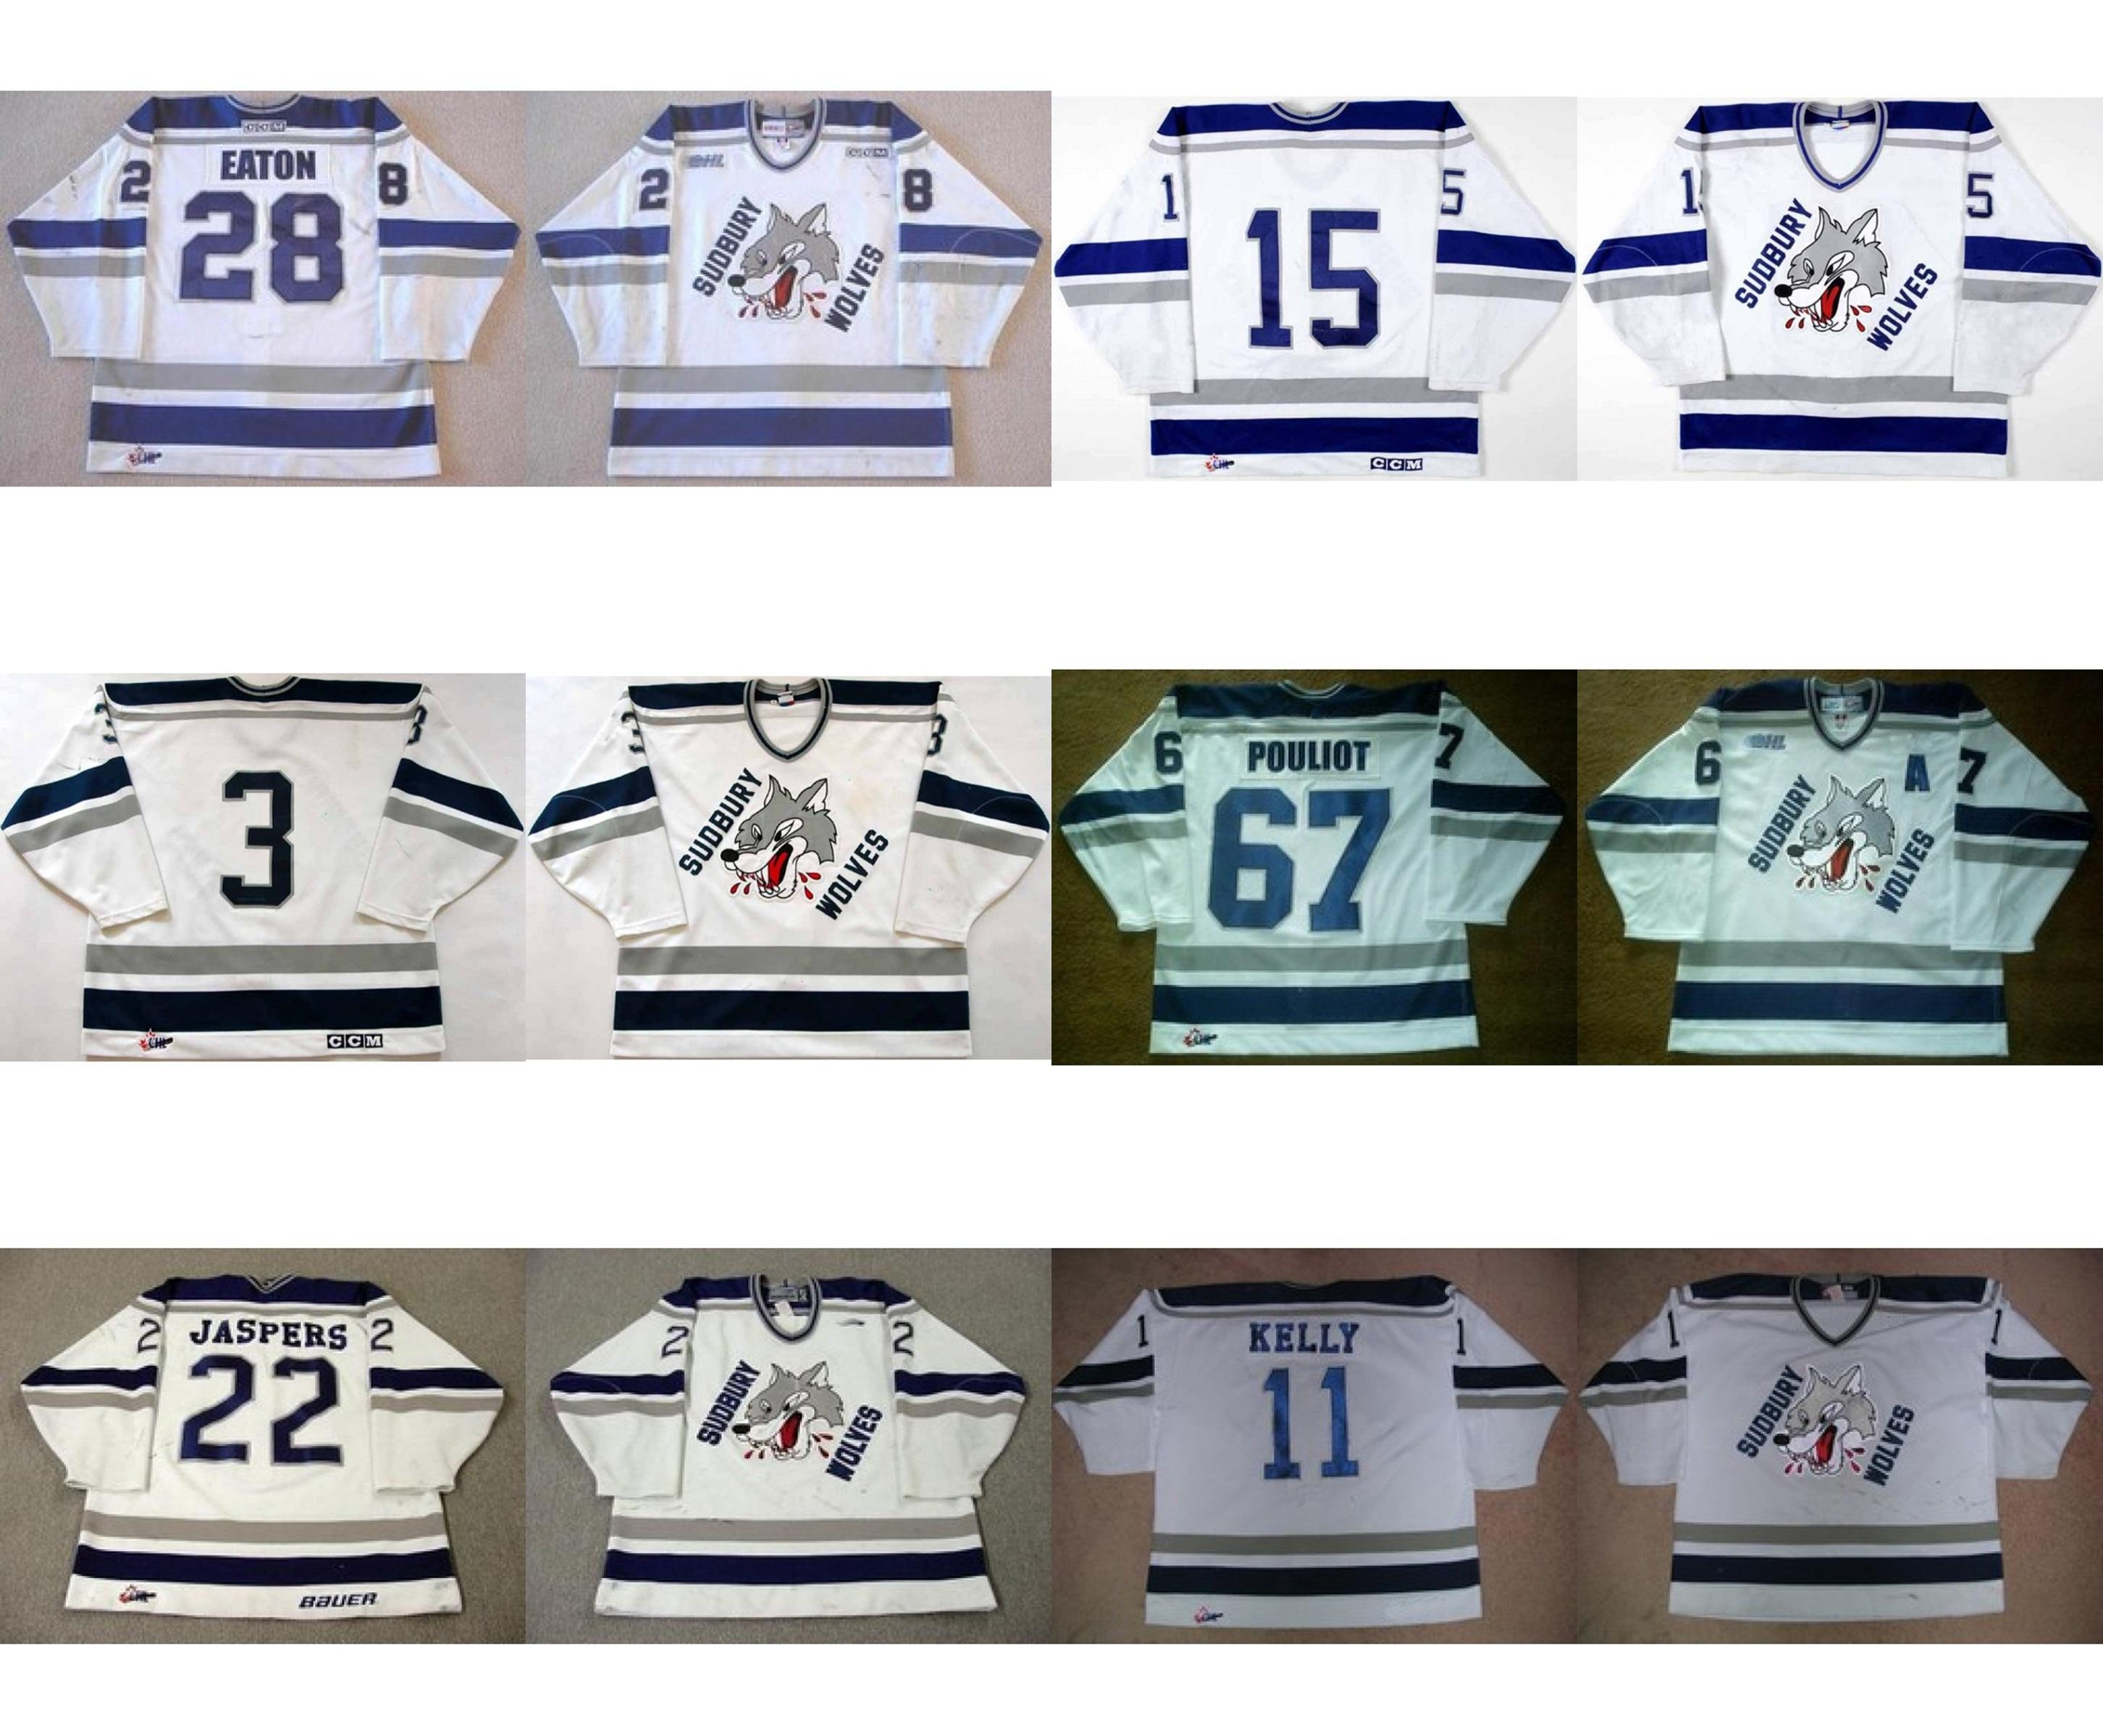 3afee35a3 2019 Customize OHL Sudbury Wolves Jersey Mens Womens Kids 3 Matthew Hodges  15 Kevin Beaumont 22 Jason Jaspers Hockey Jerseys Goalit Cut Cheap From  Since